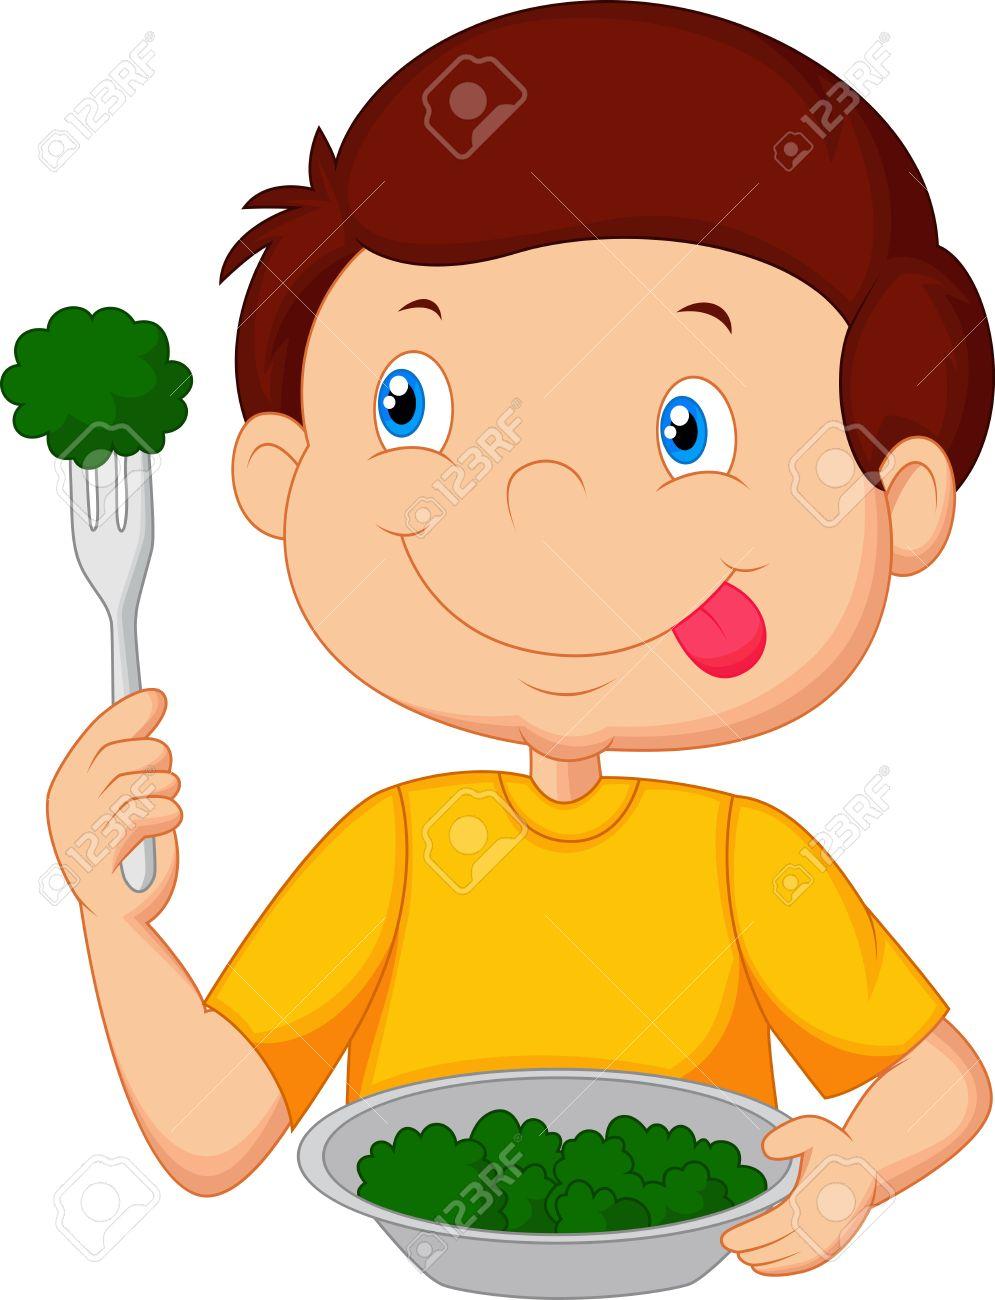 Resultado de imagen de niño comiendo dibujo animado